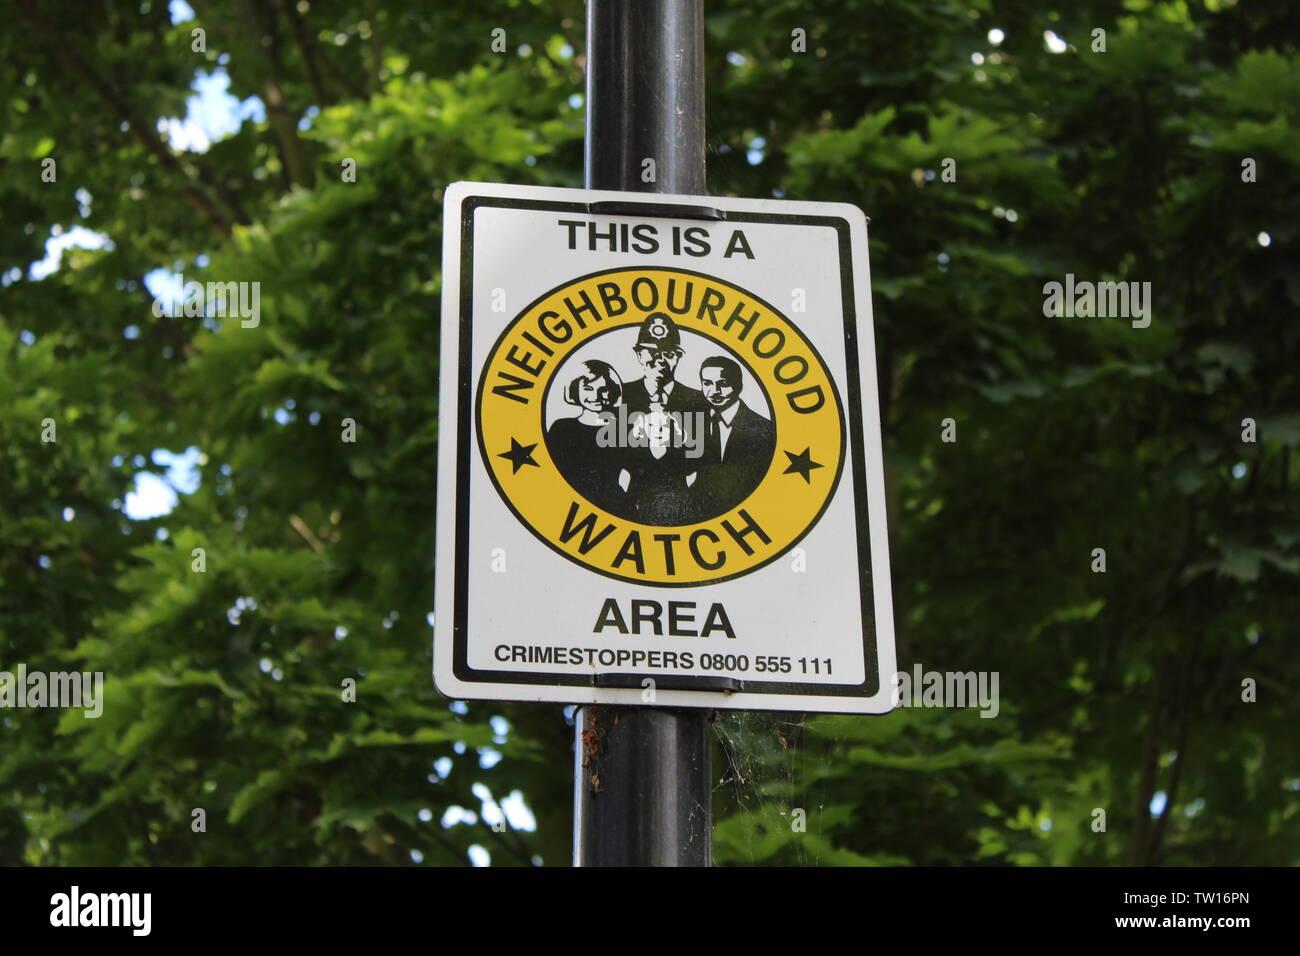 Neighbourhood watch sign. - Stock Image